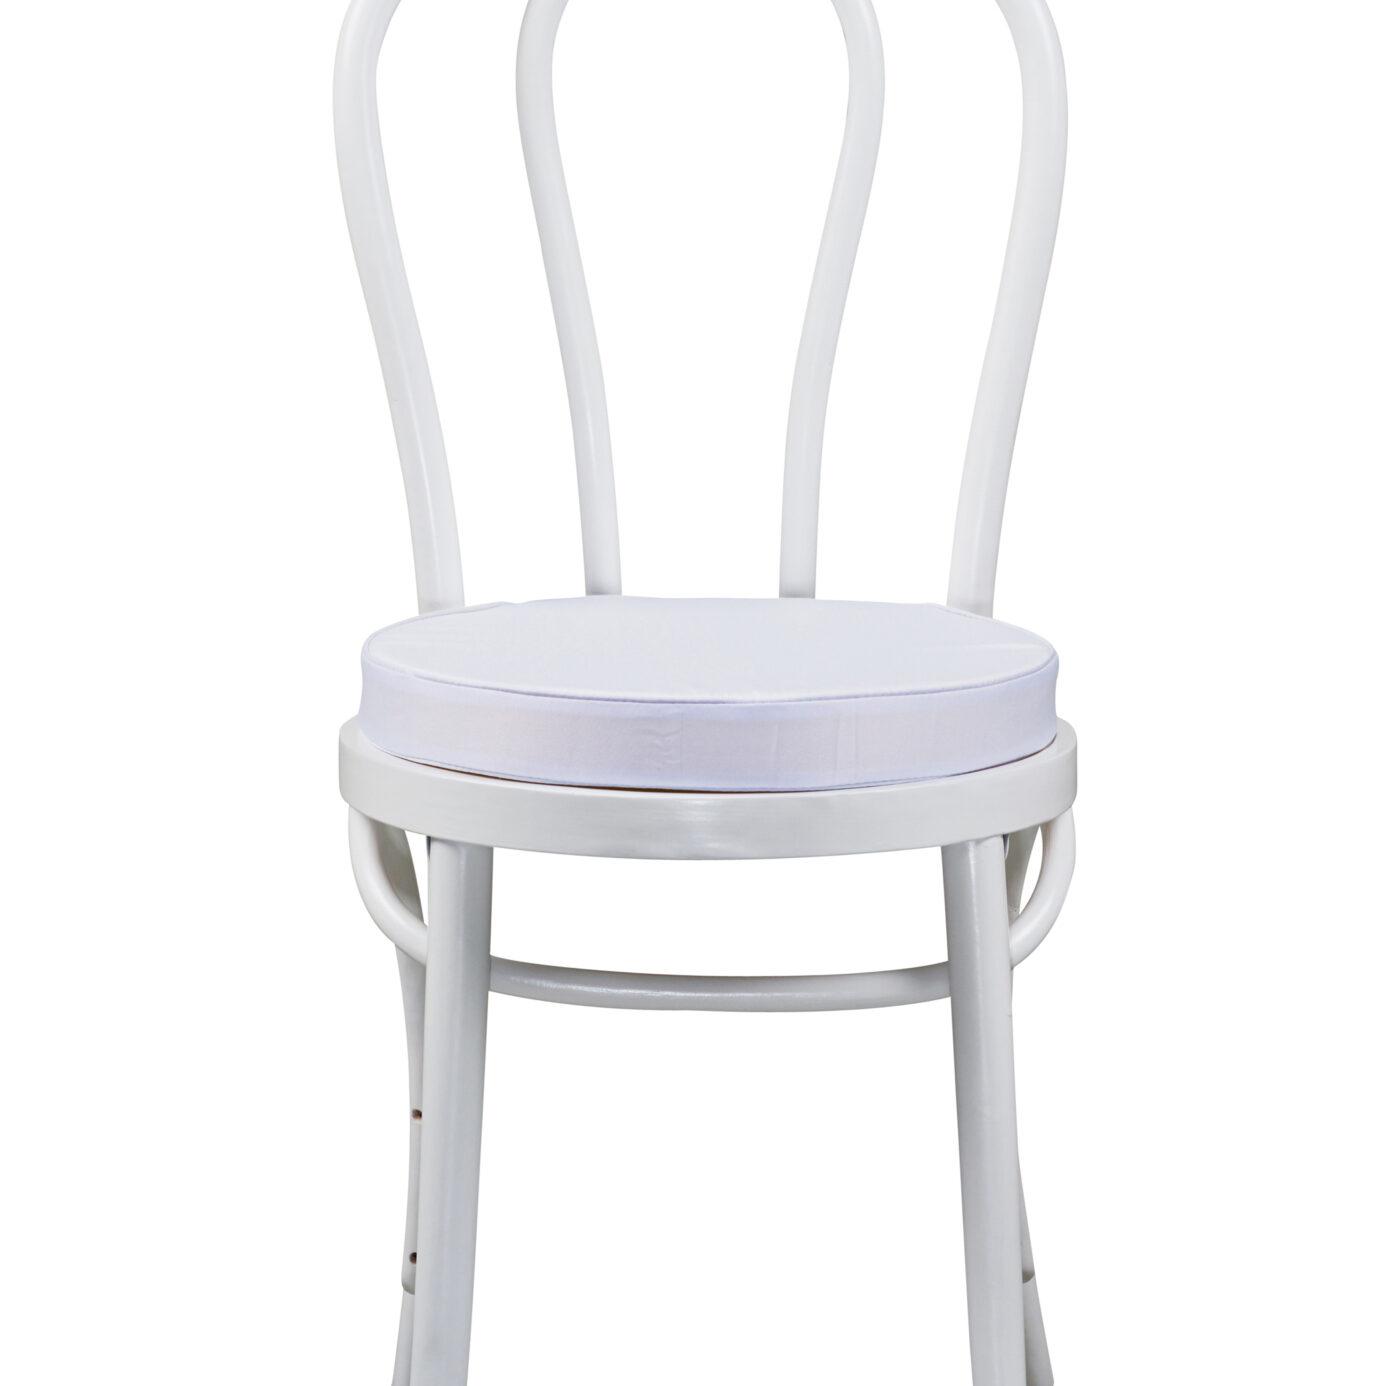 Bentwood Chair - White - Event Artillery